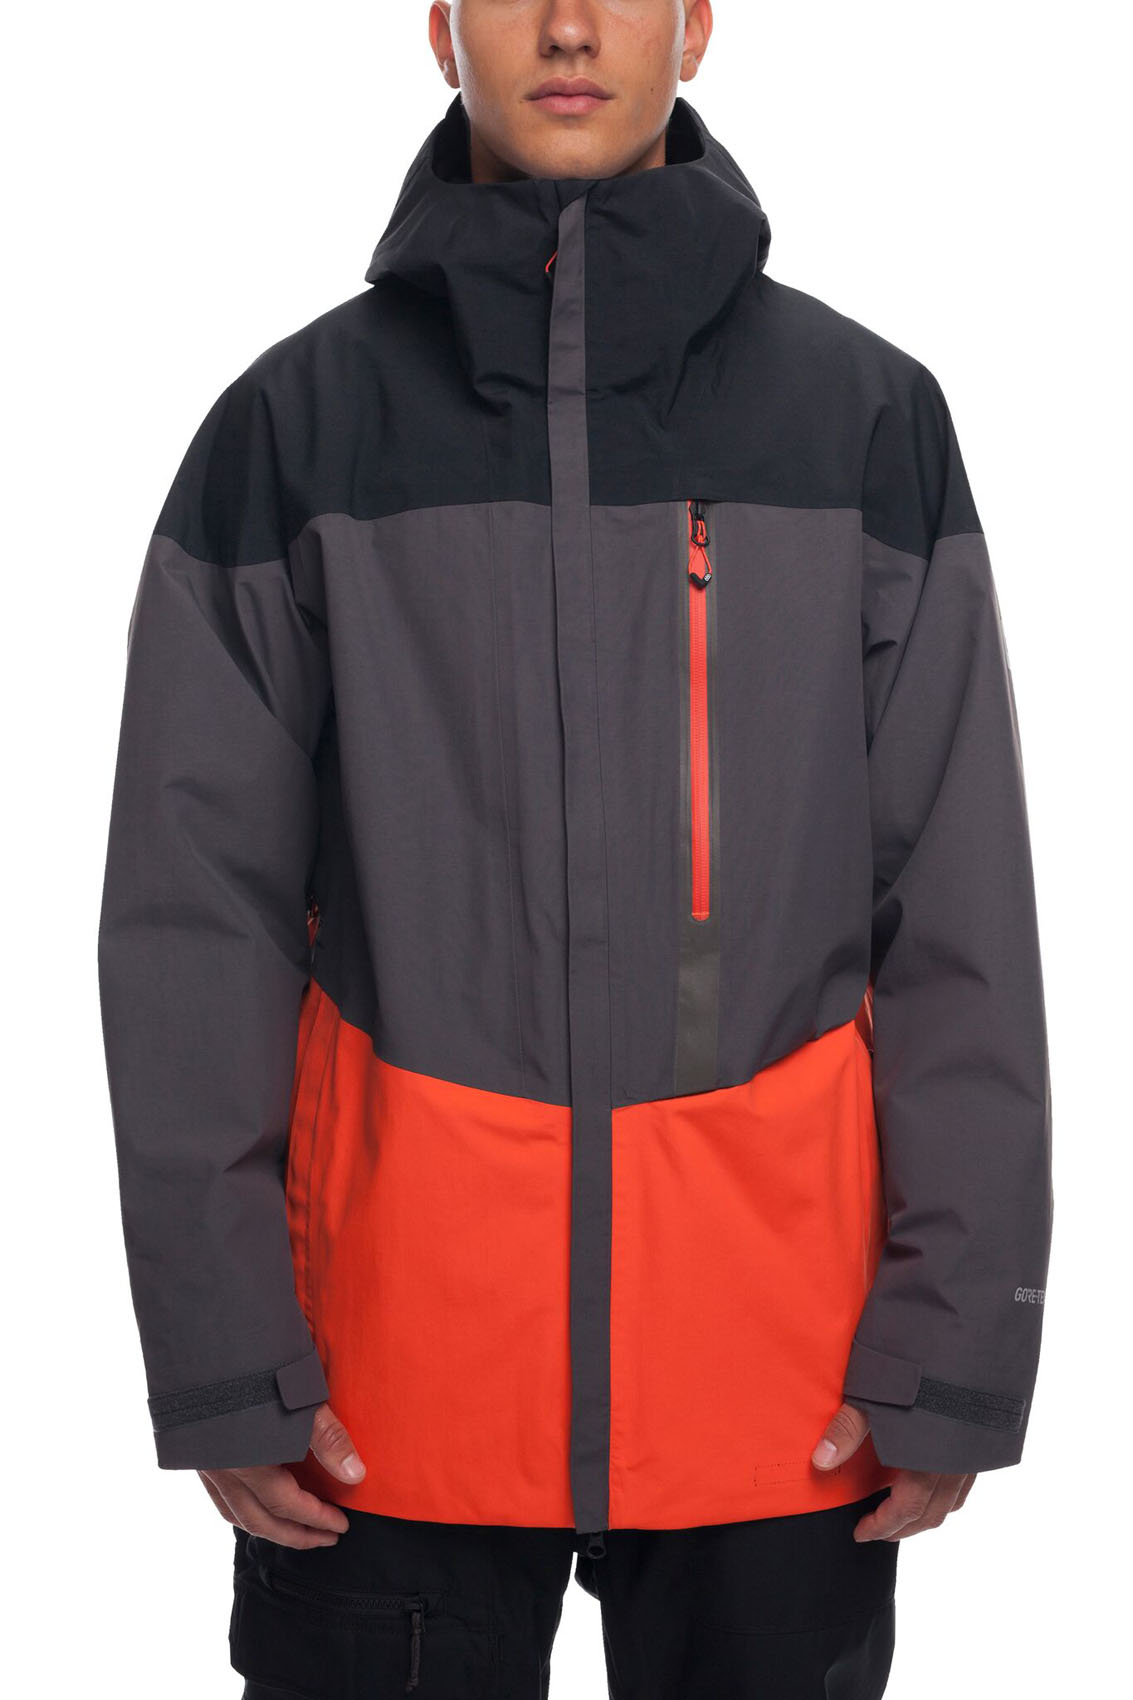 a644b0812685 686 Gore-Tex GT Snowboard Jacket 2019